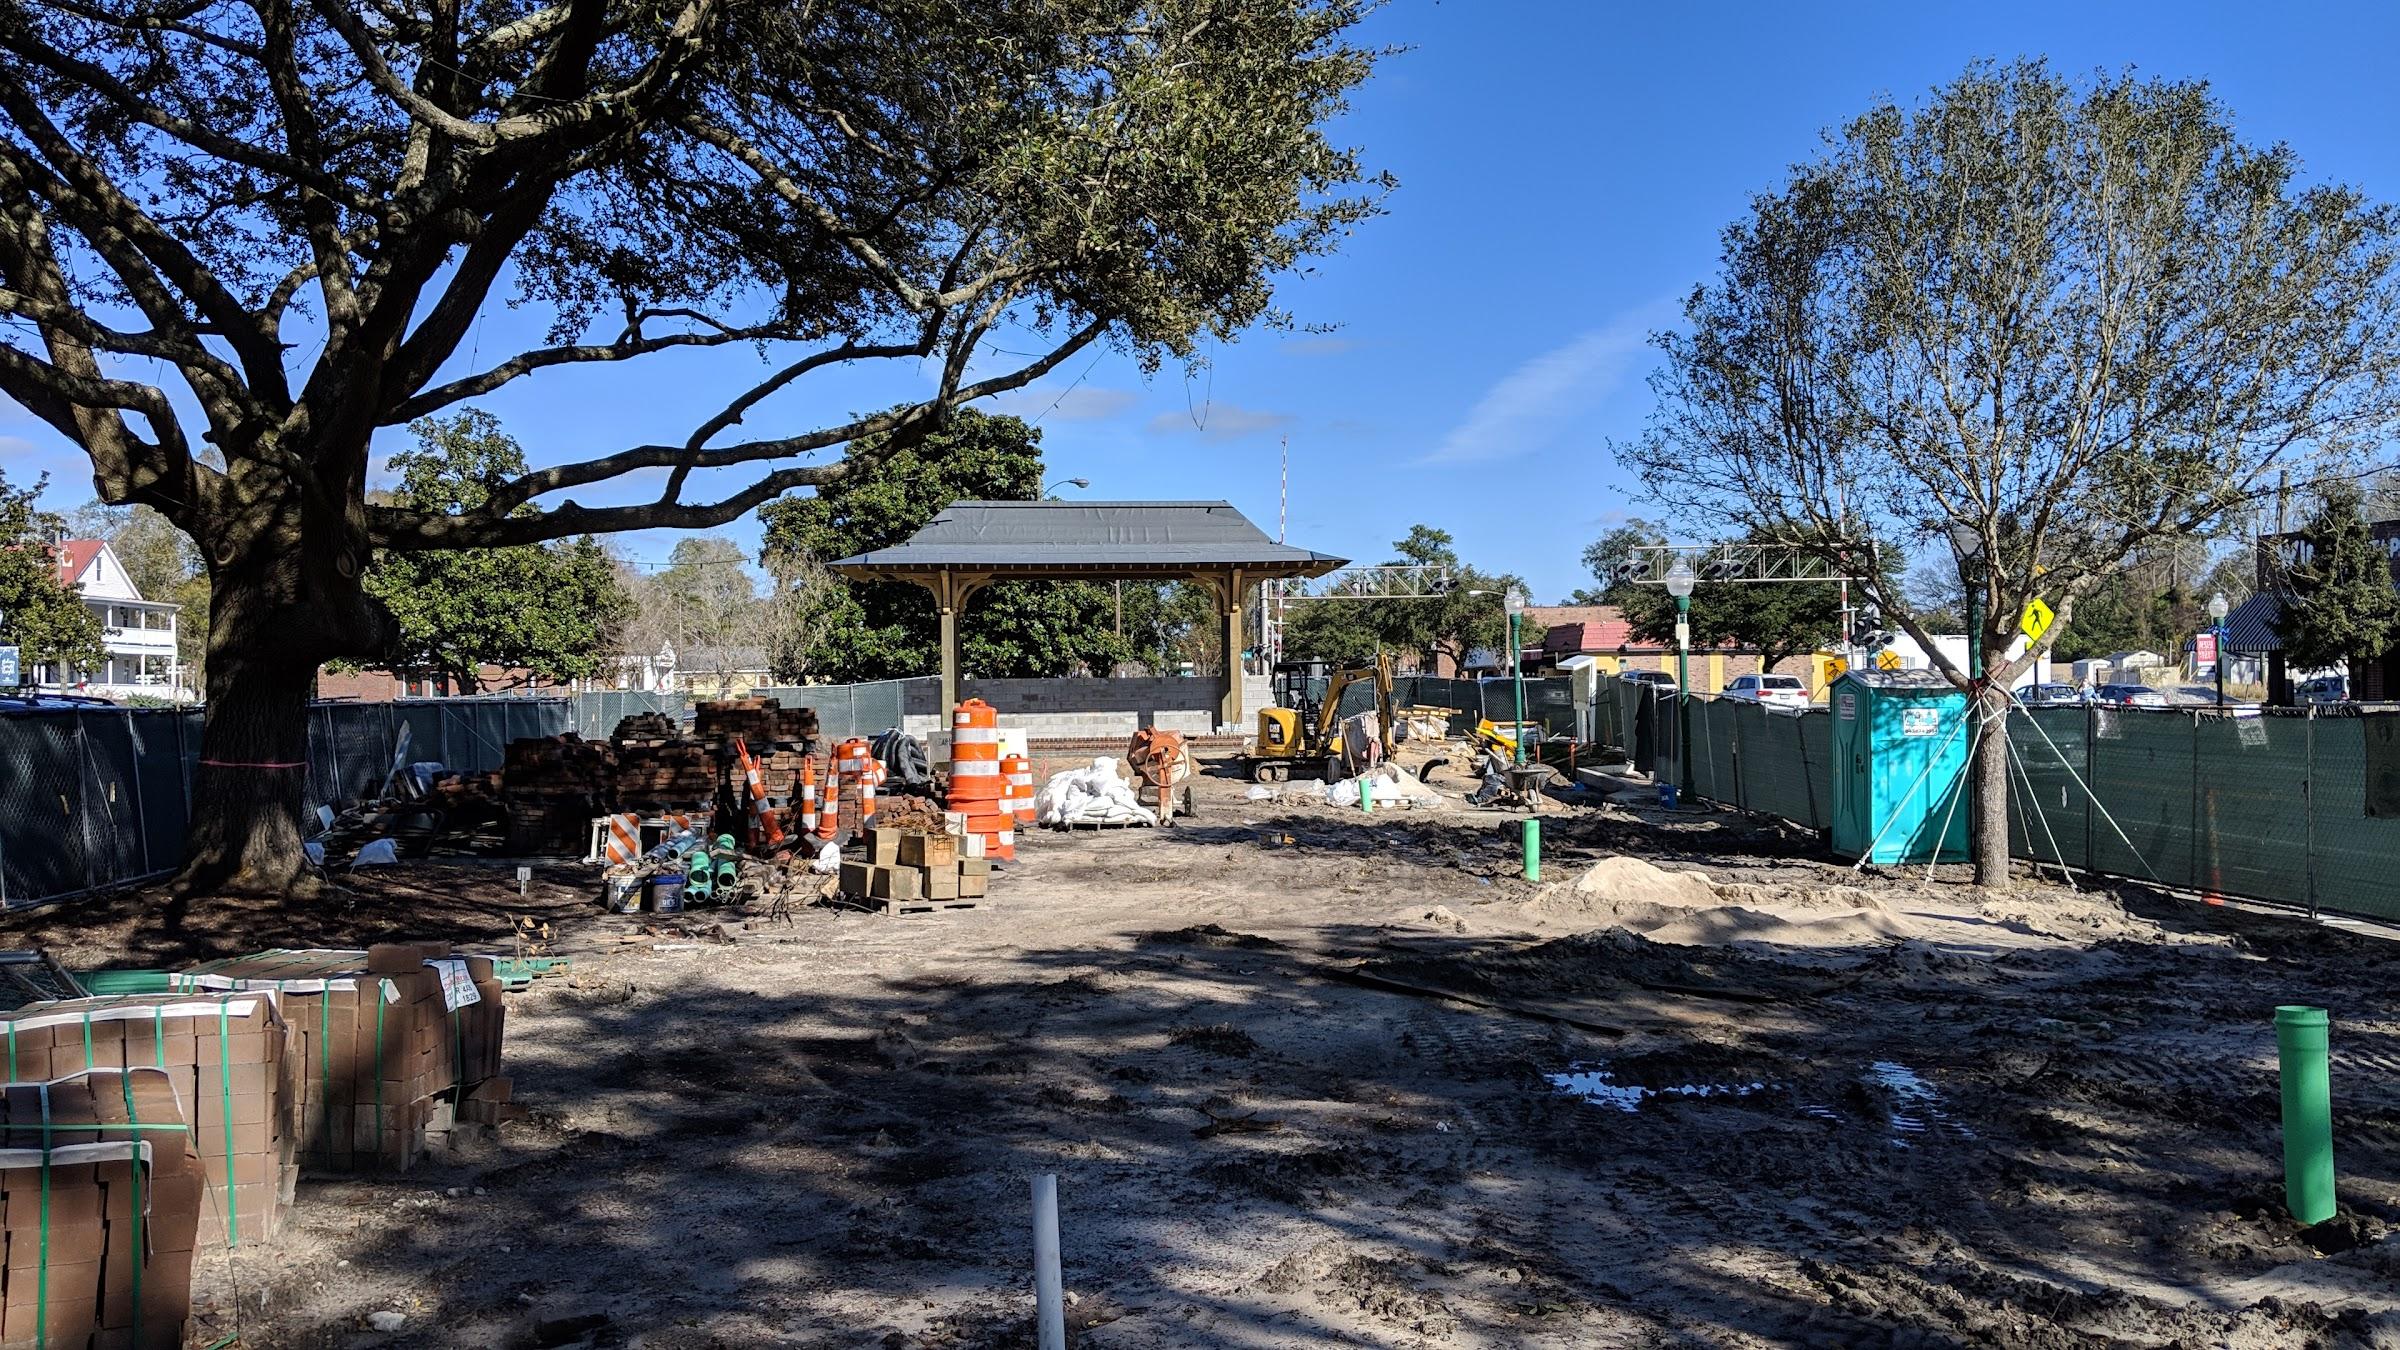 Summerville city center park under construction